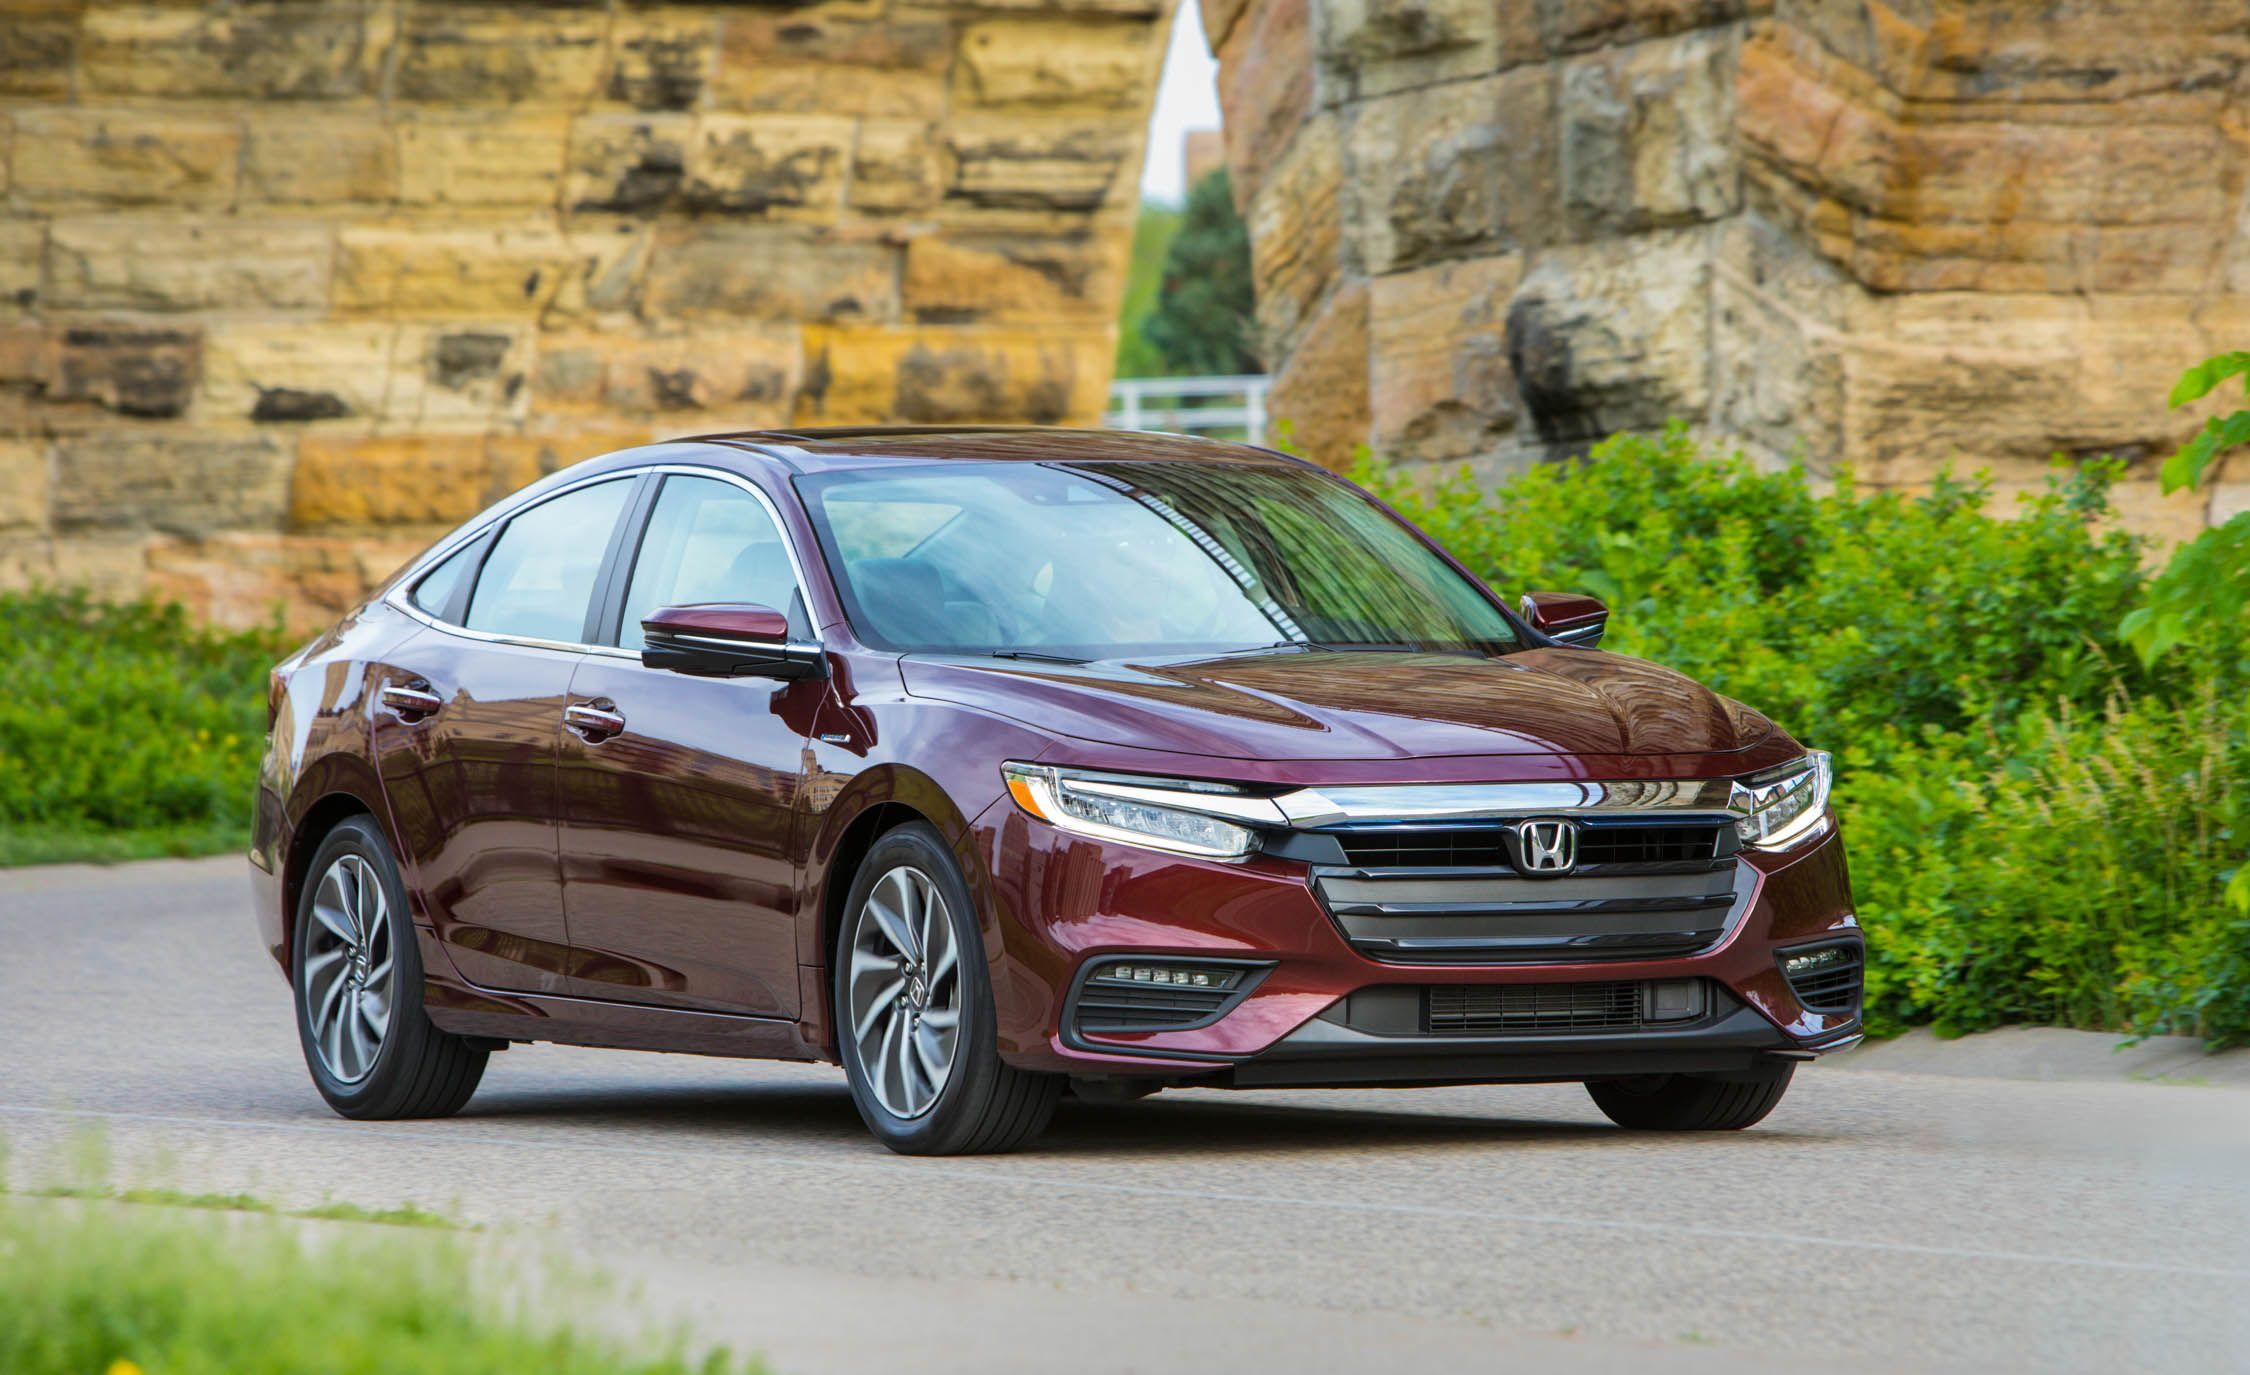 2019 Honda Insight Hybrid Comes In under $24,000